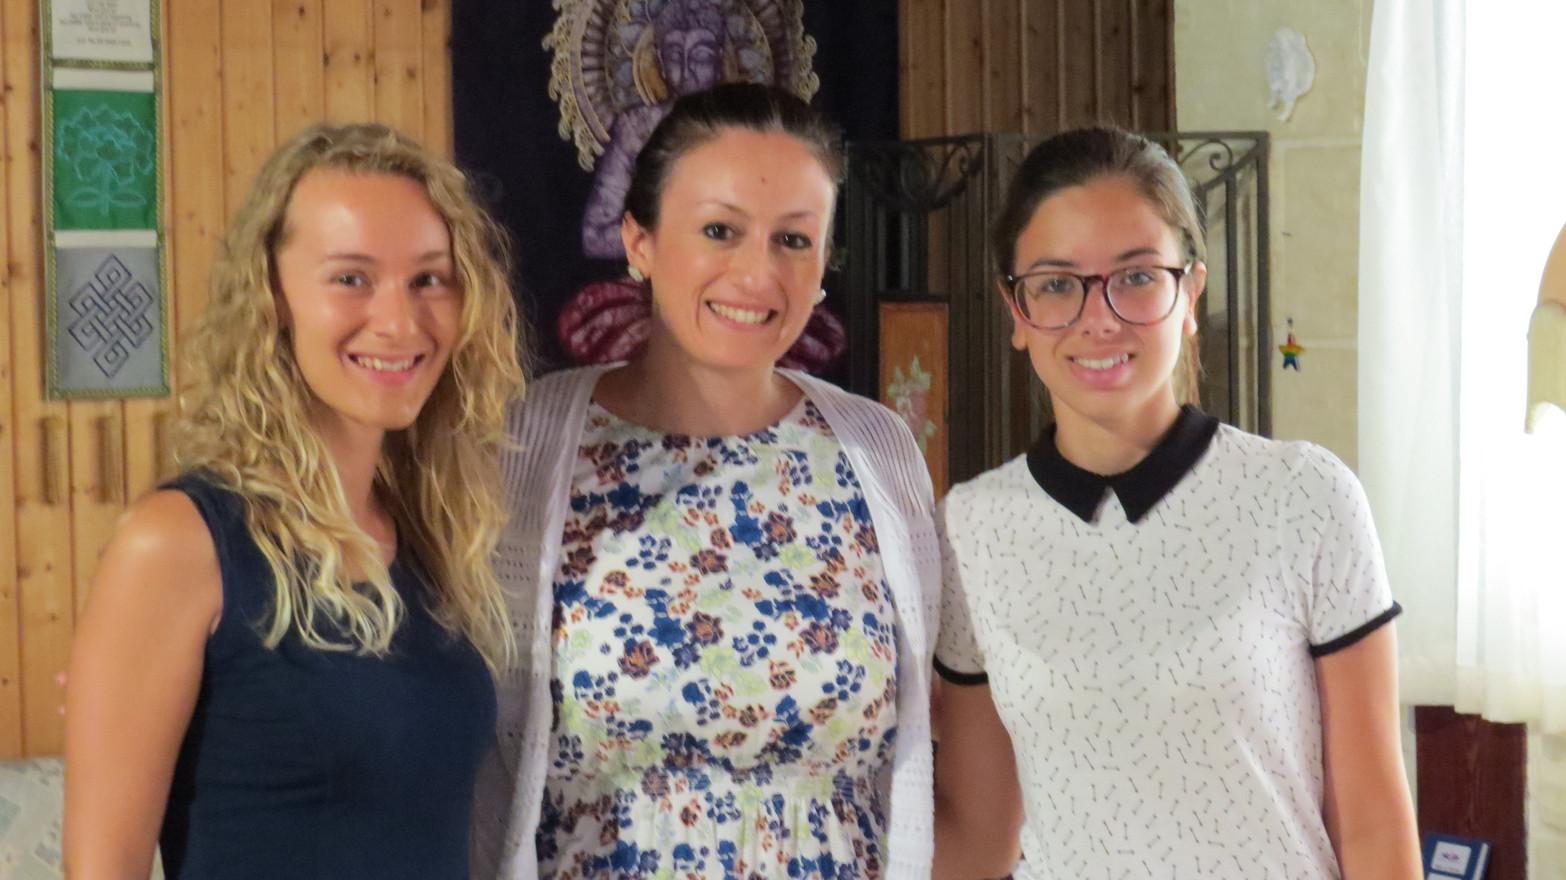 (left to right) Lisa Rossmann, Stephanie Micallef, Jessica Mercieca